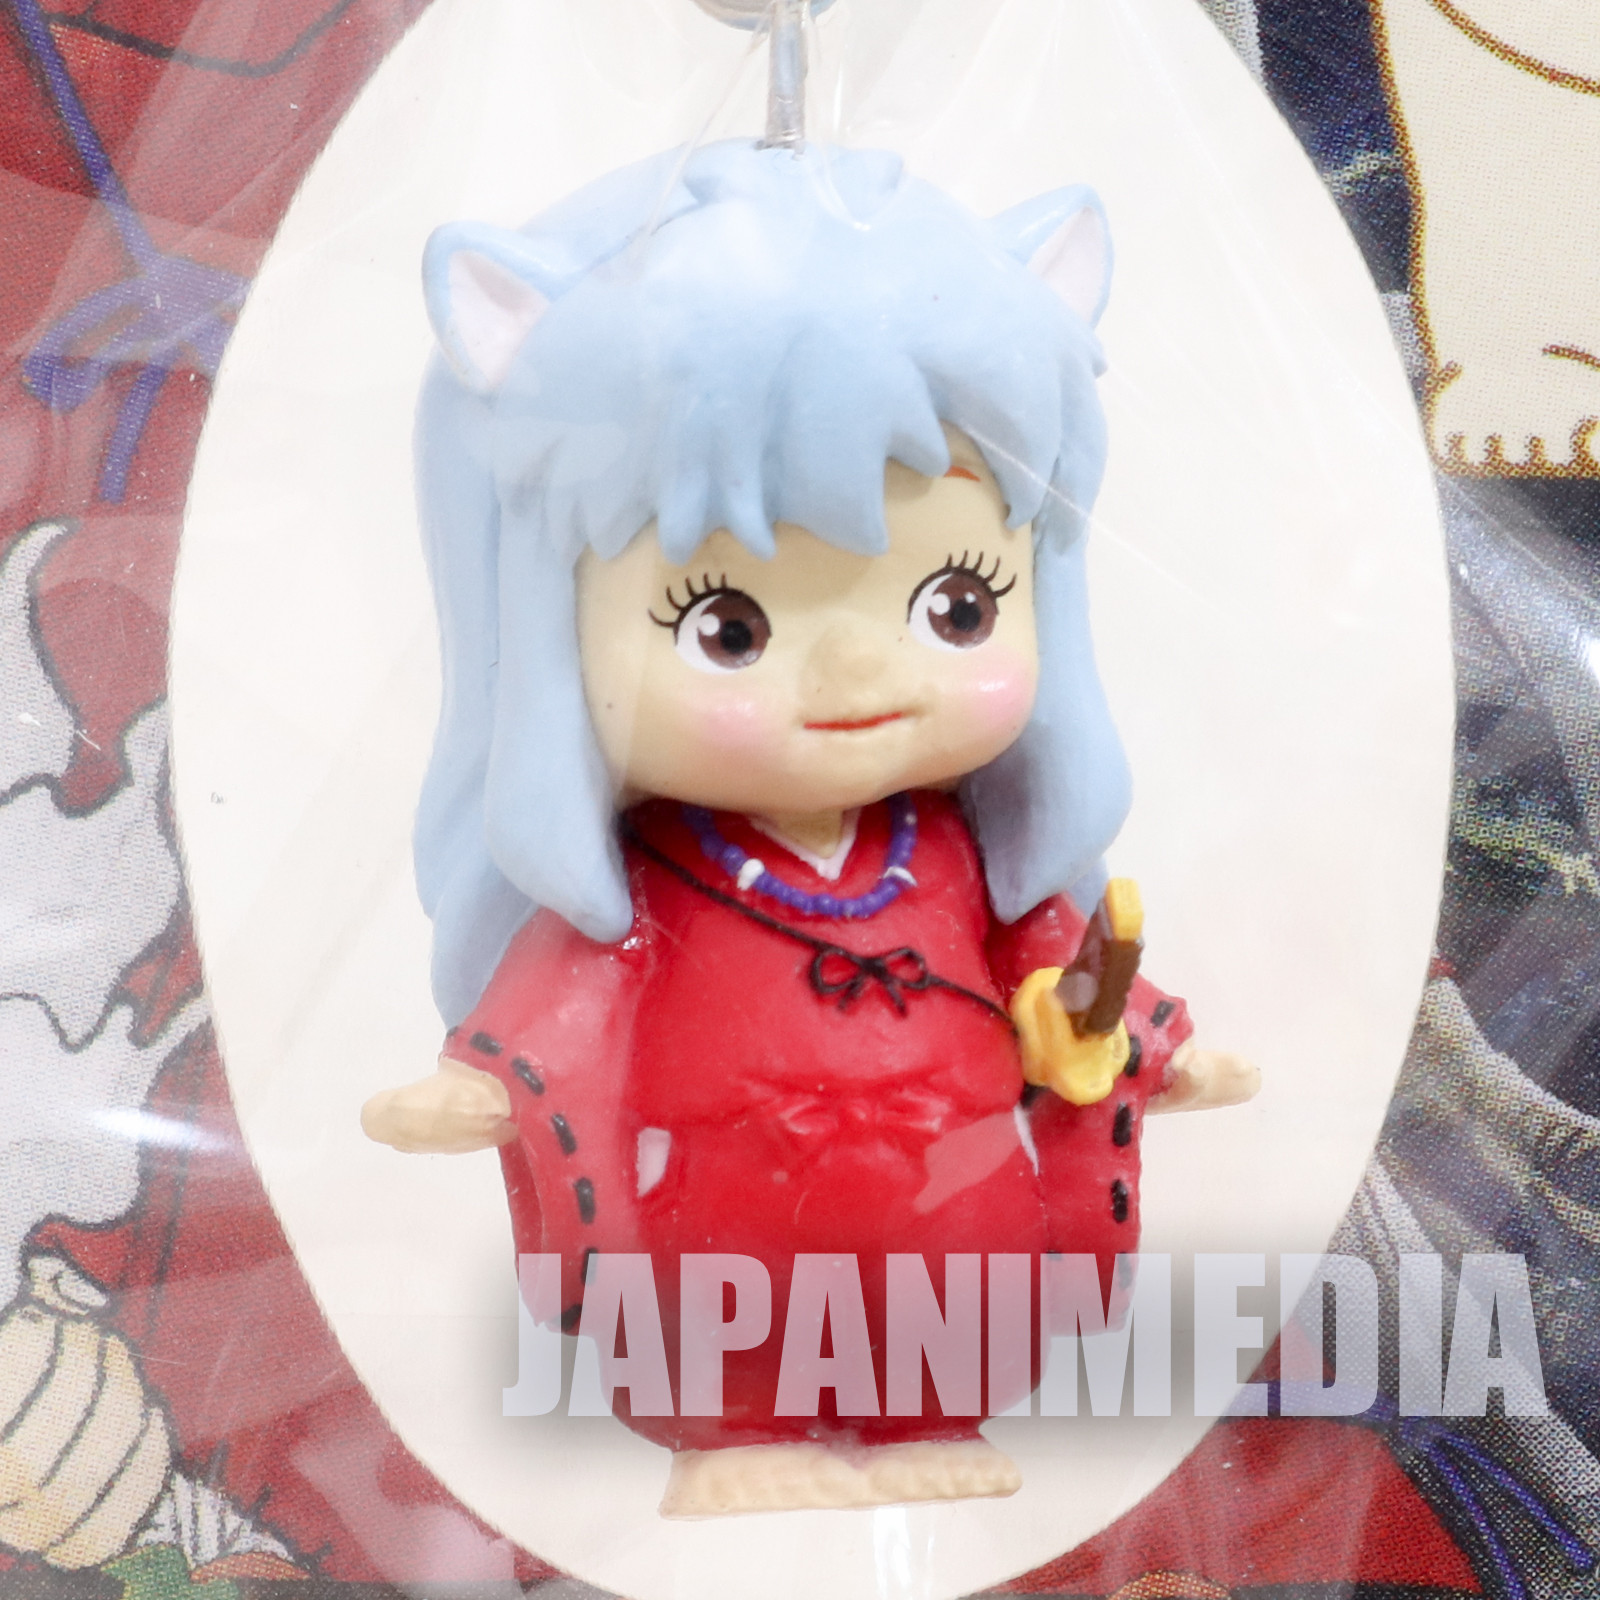 RARE! Inuyasha Rose O'neill Kewpie Kewsion Figure Strap JAPAN ANIME 2